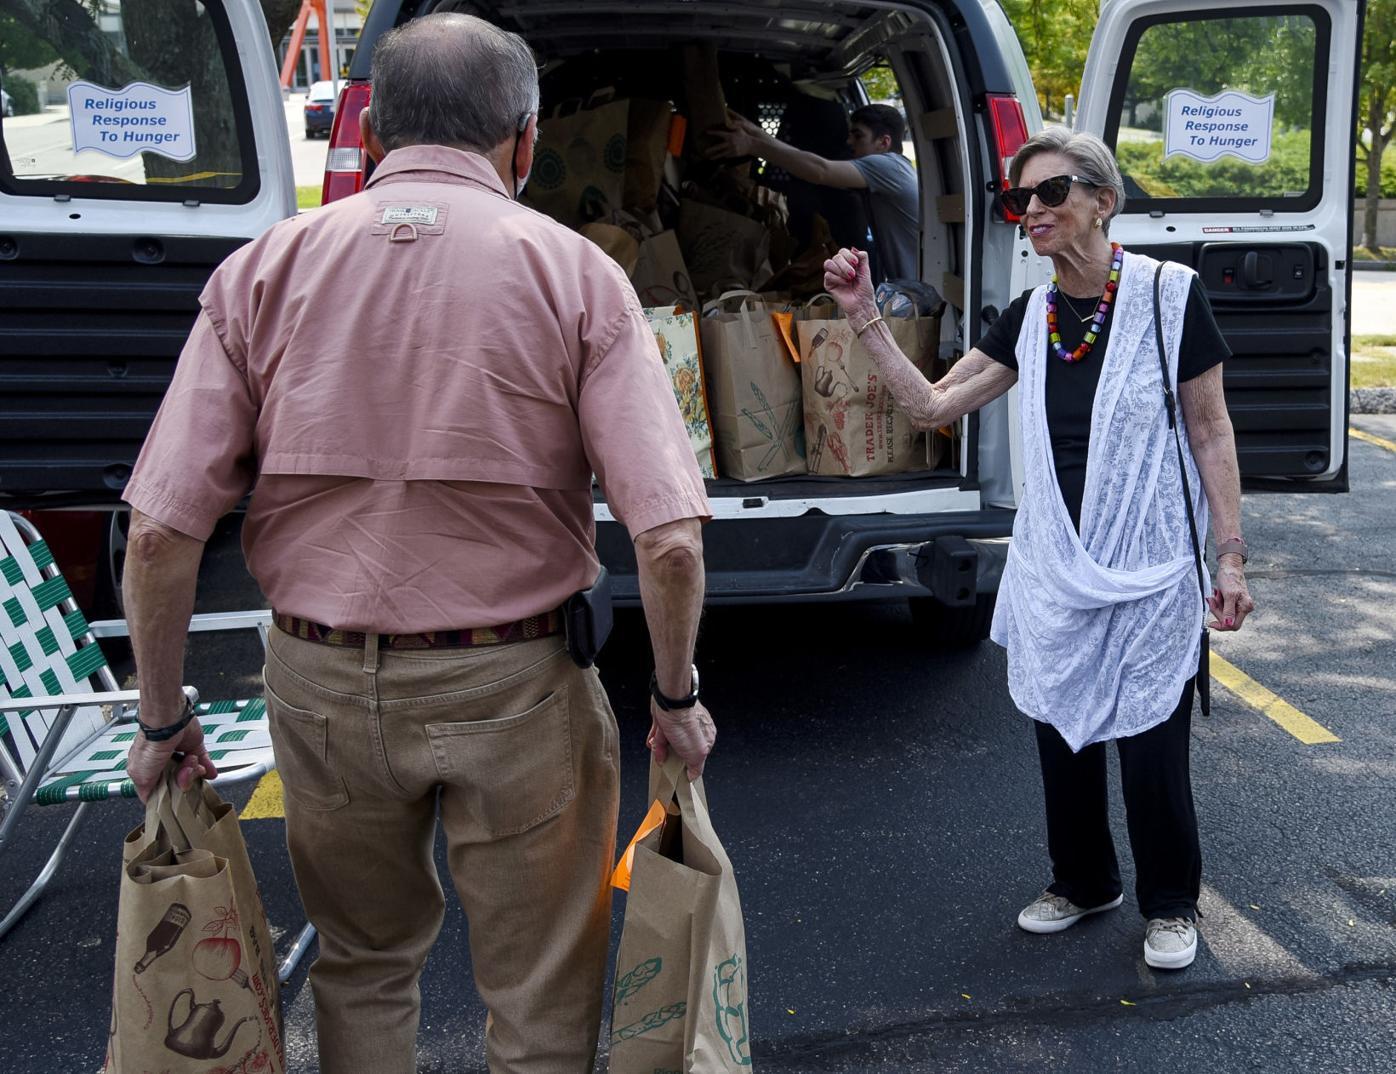 Temple Adath Yeshurun welcomes food donations